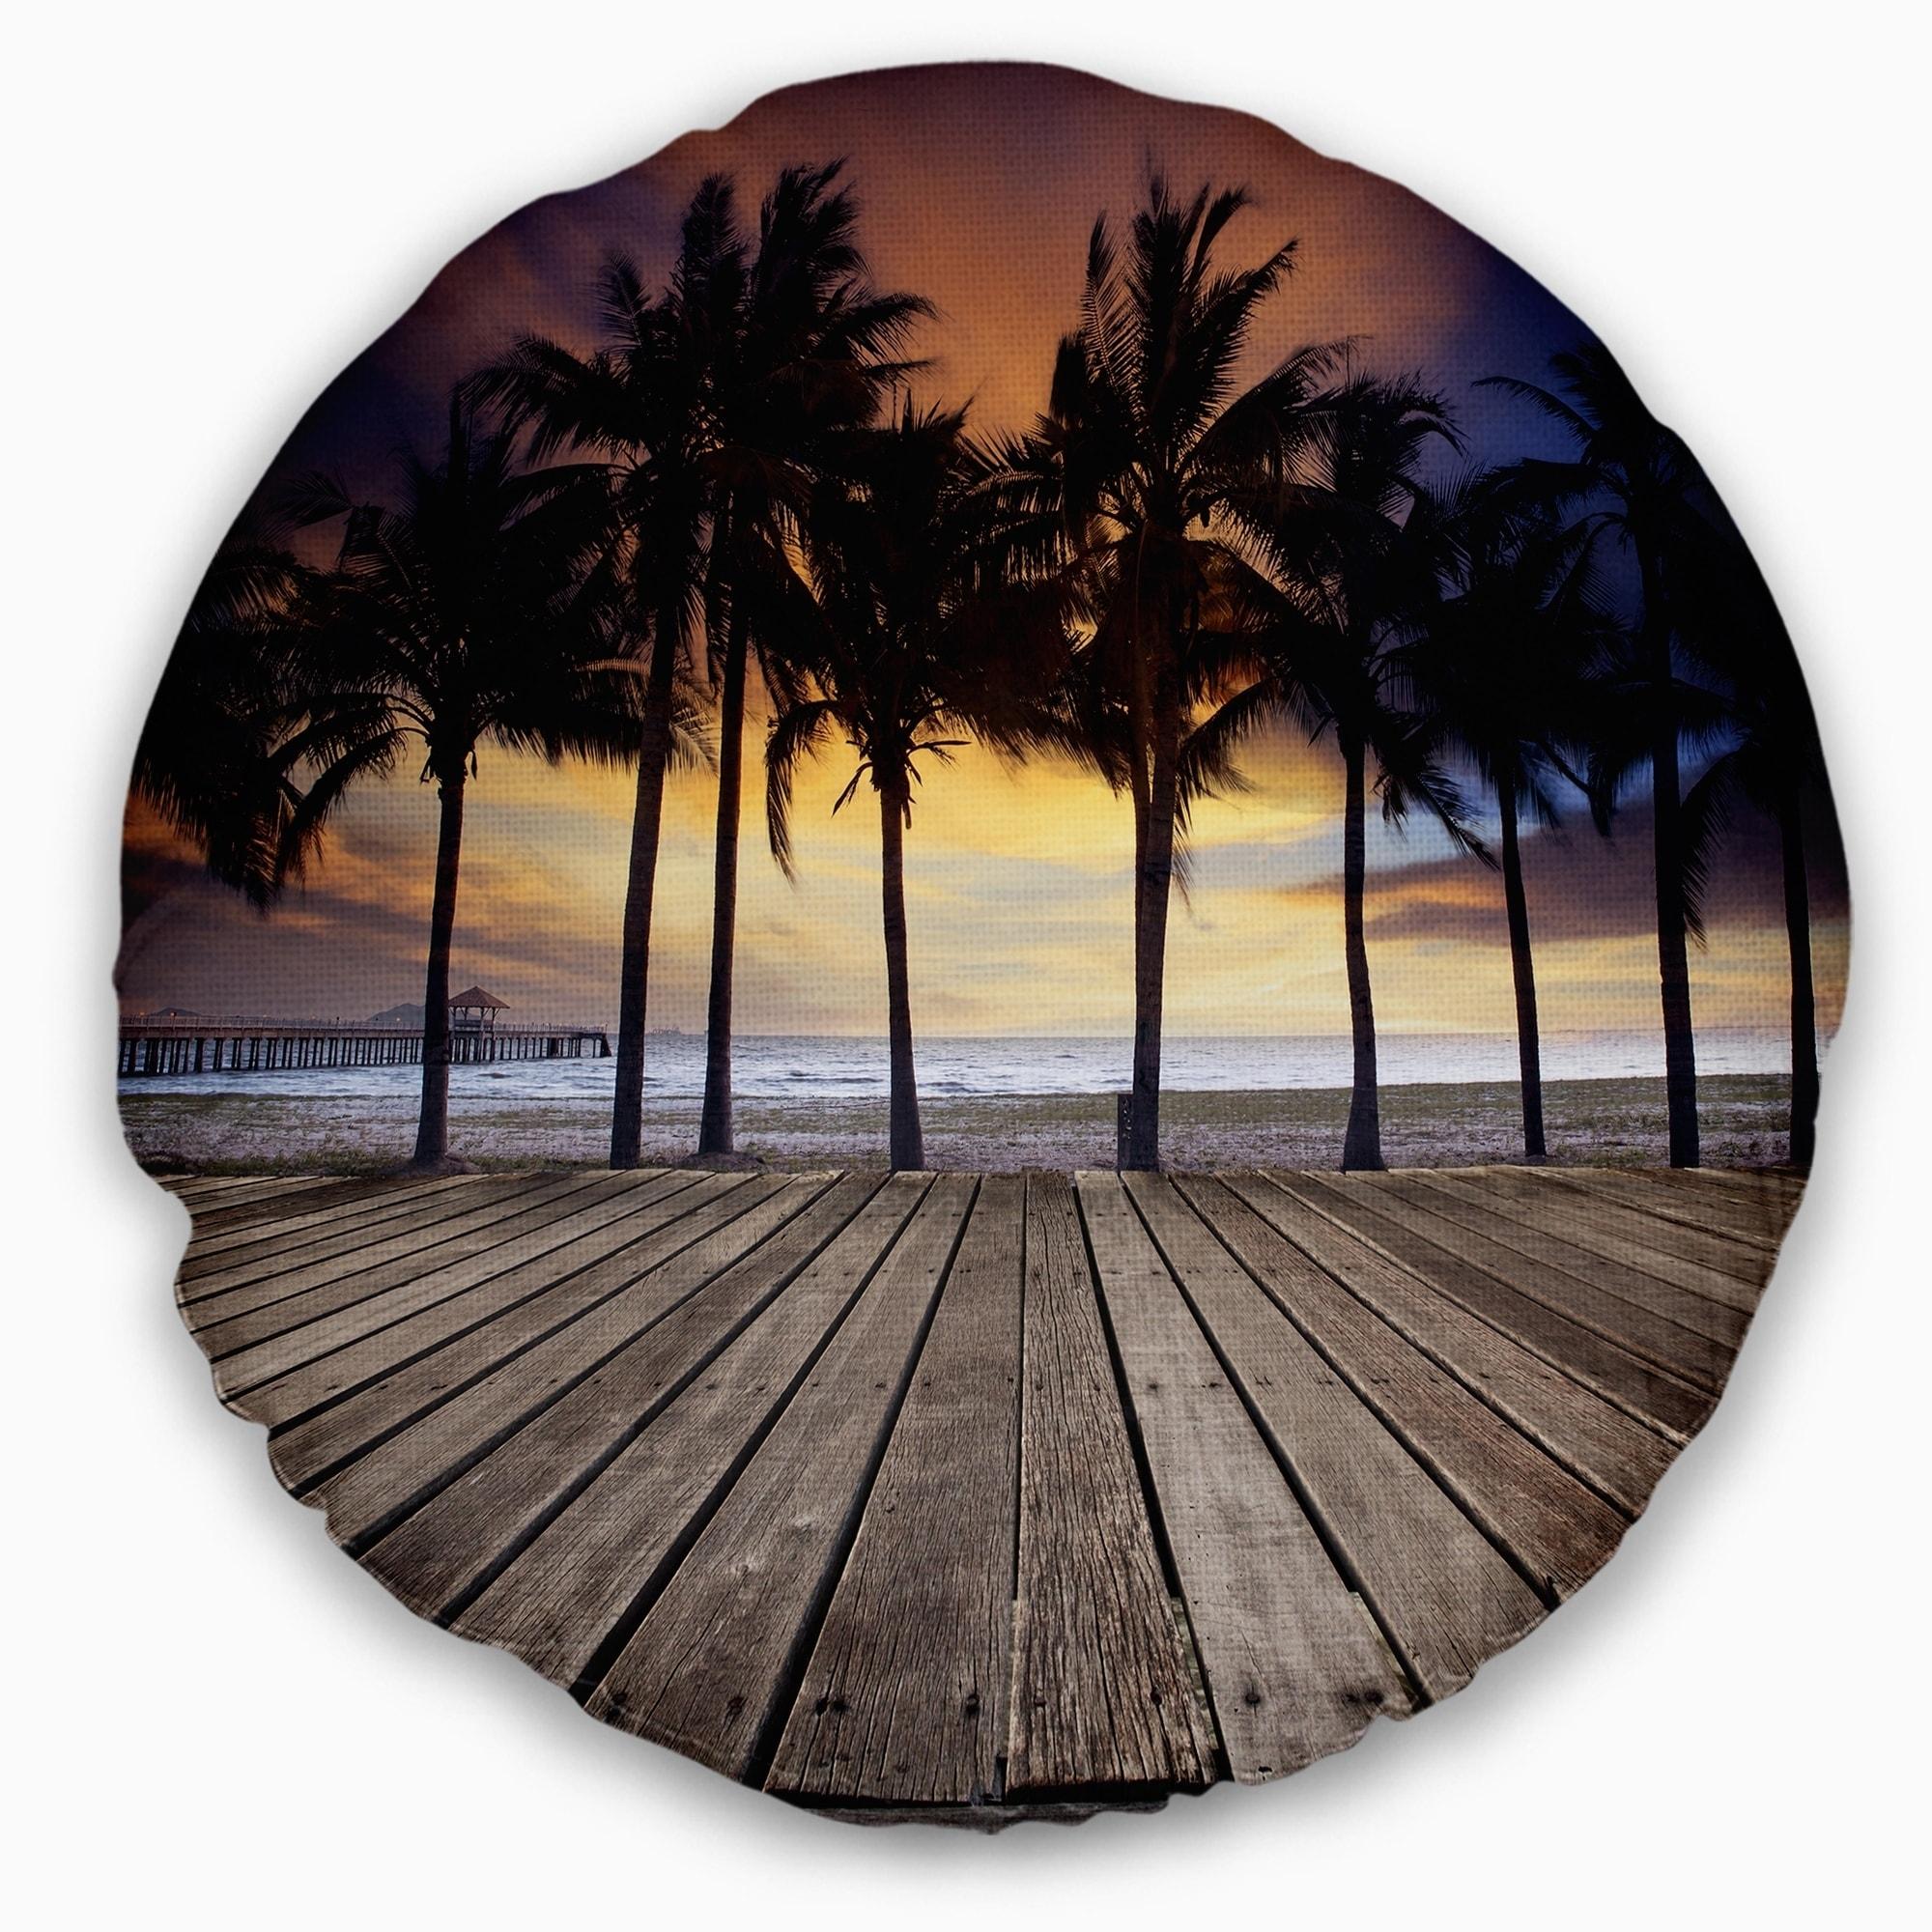 Designart Old Wood Terrace On Sea Beach Modern Landscape Printed Throw Pillow On Sale Overstock 20890500